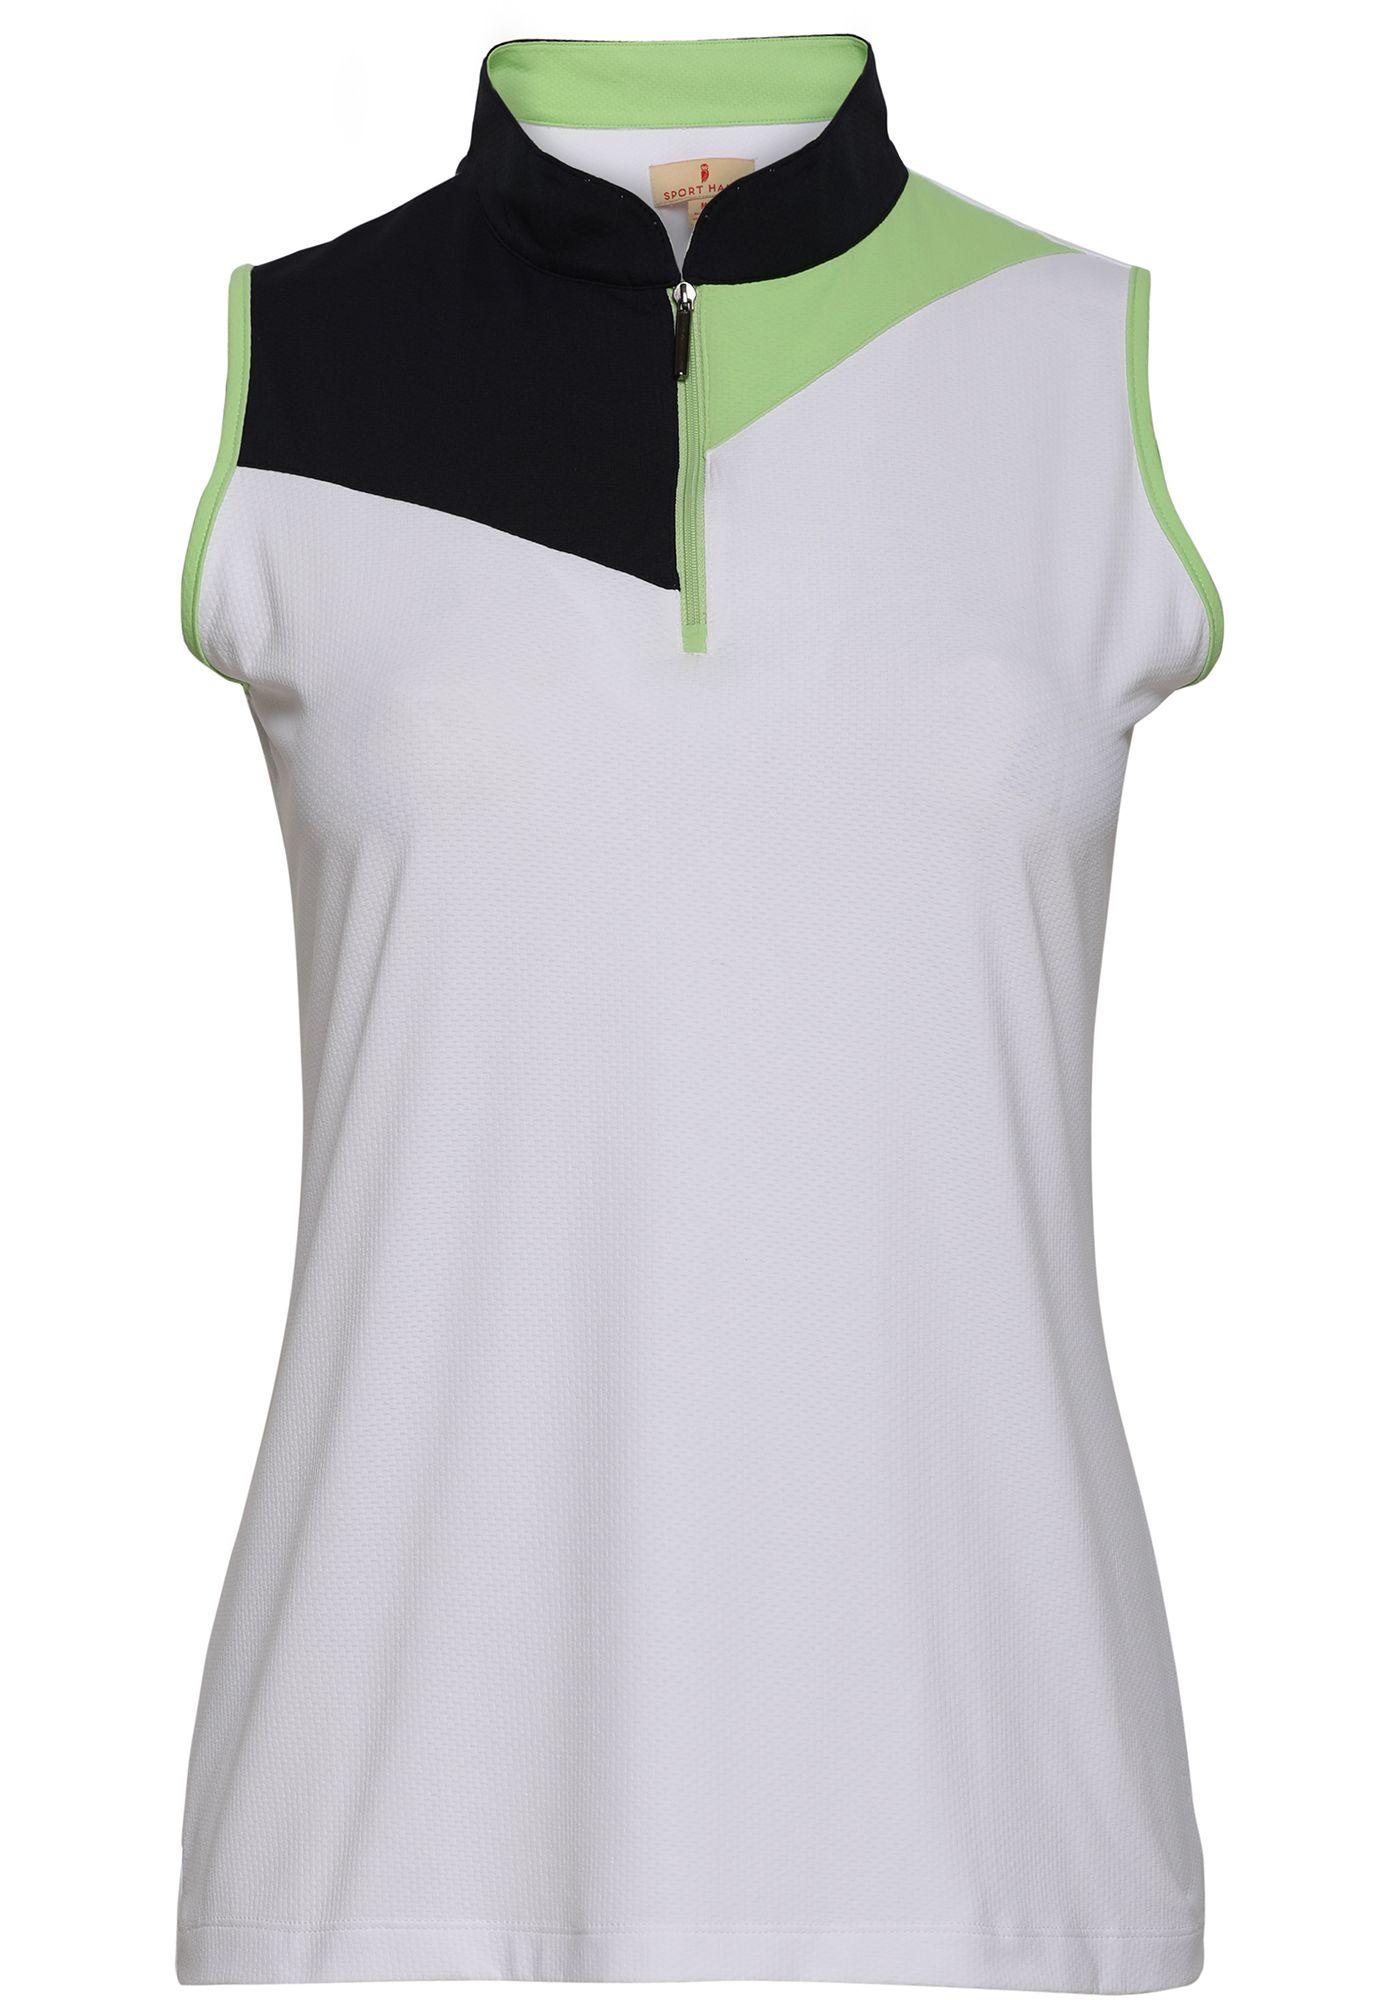 Sport Haley Women's Colorblock Sleeveless Golf Polo